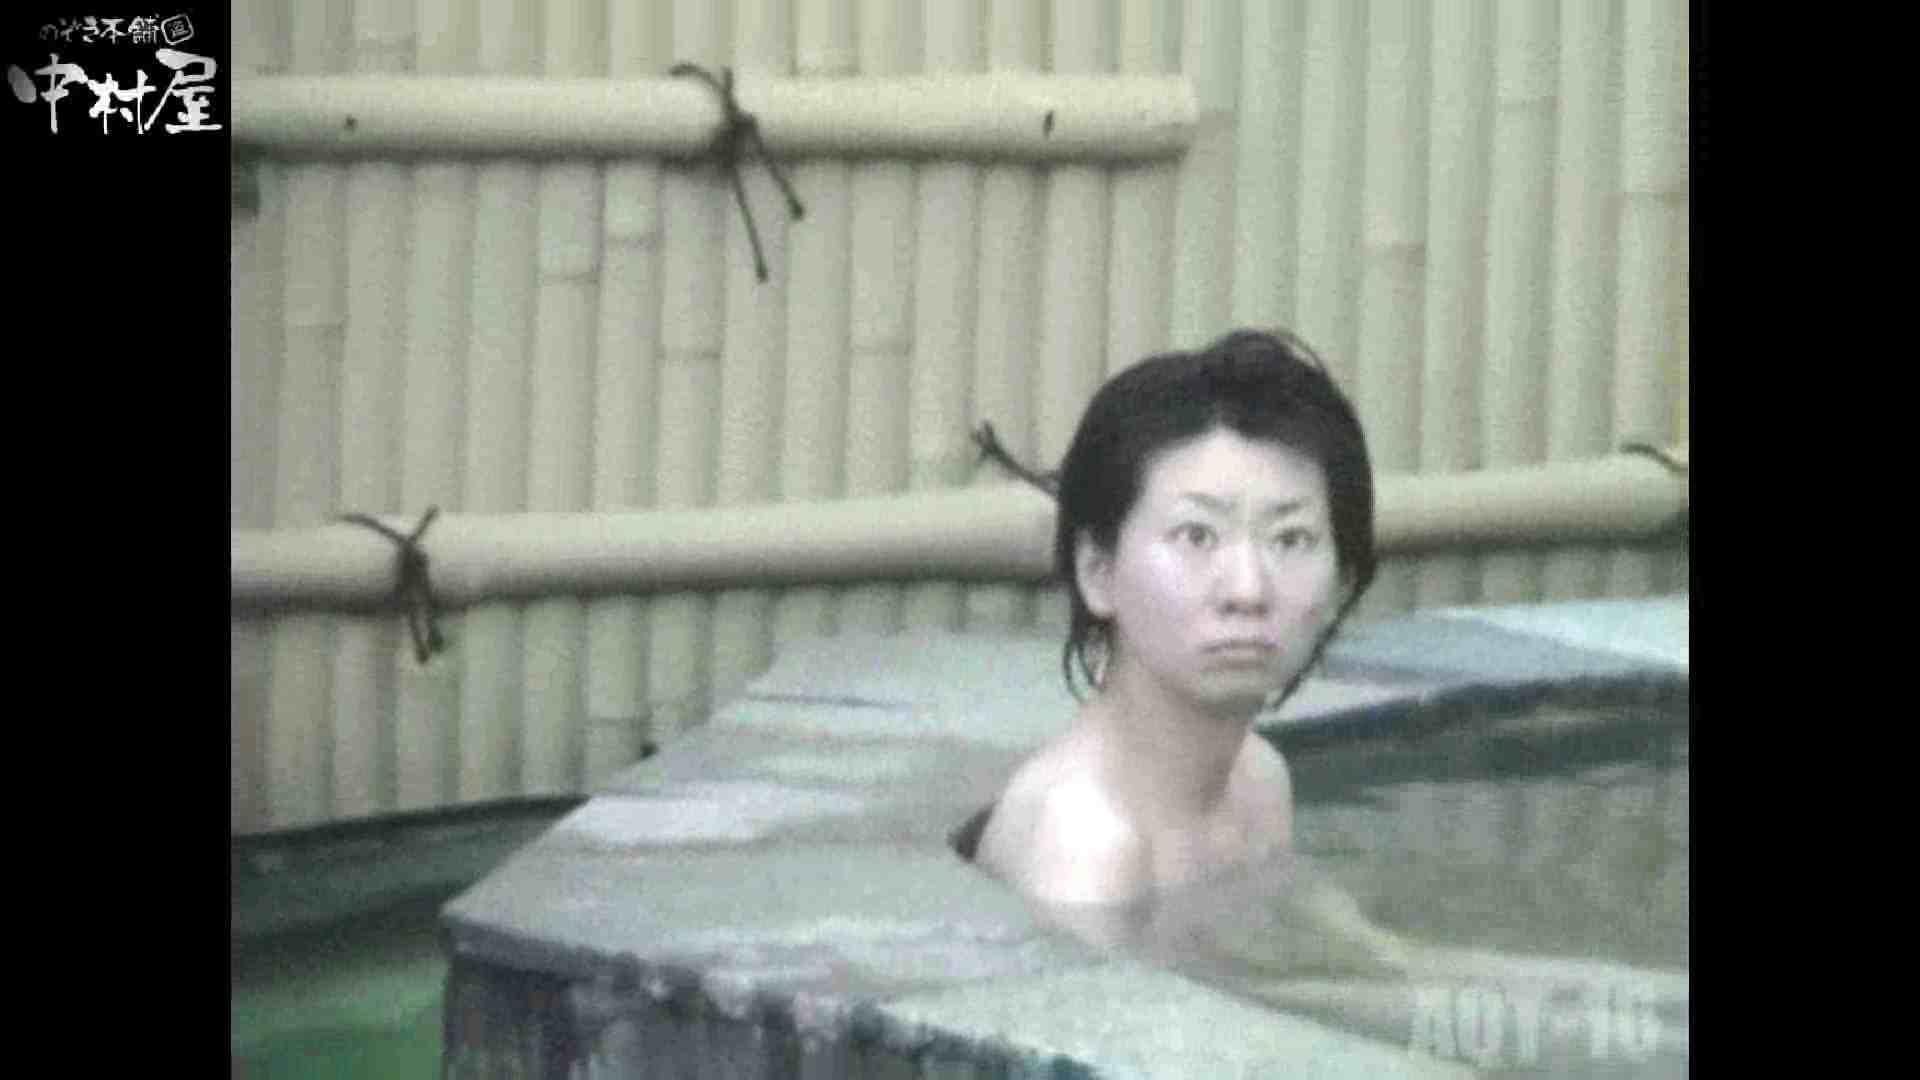 Aquaな露天風呂Vol.880潜入盗撮露天風呂十六判湯 其の三 潜入 | OLセックス  61画像 37